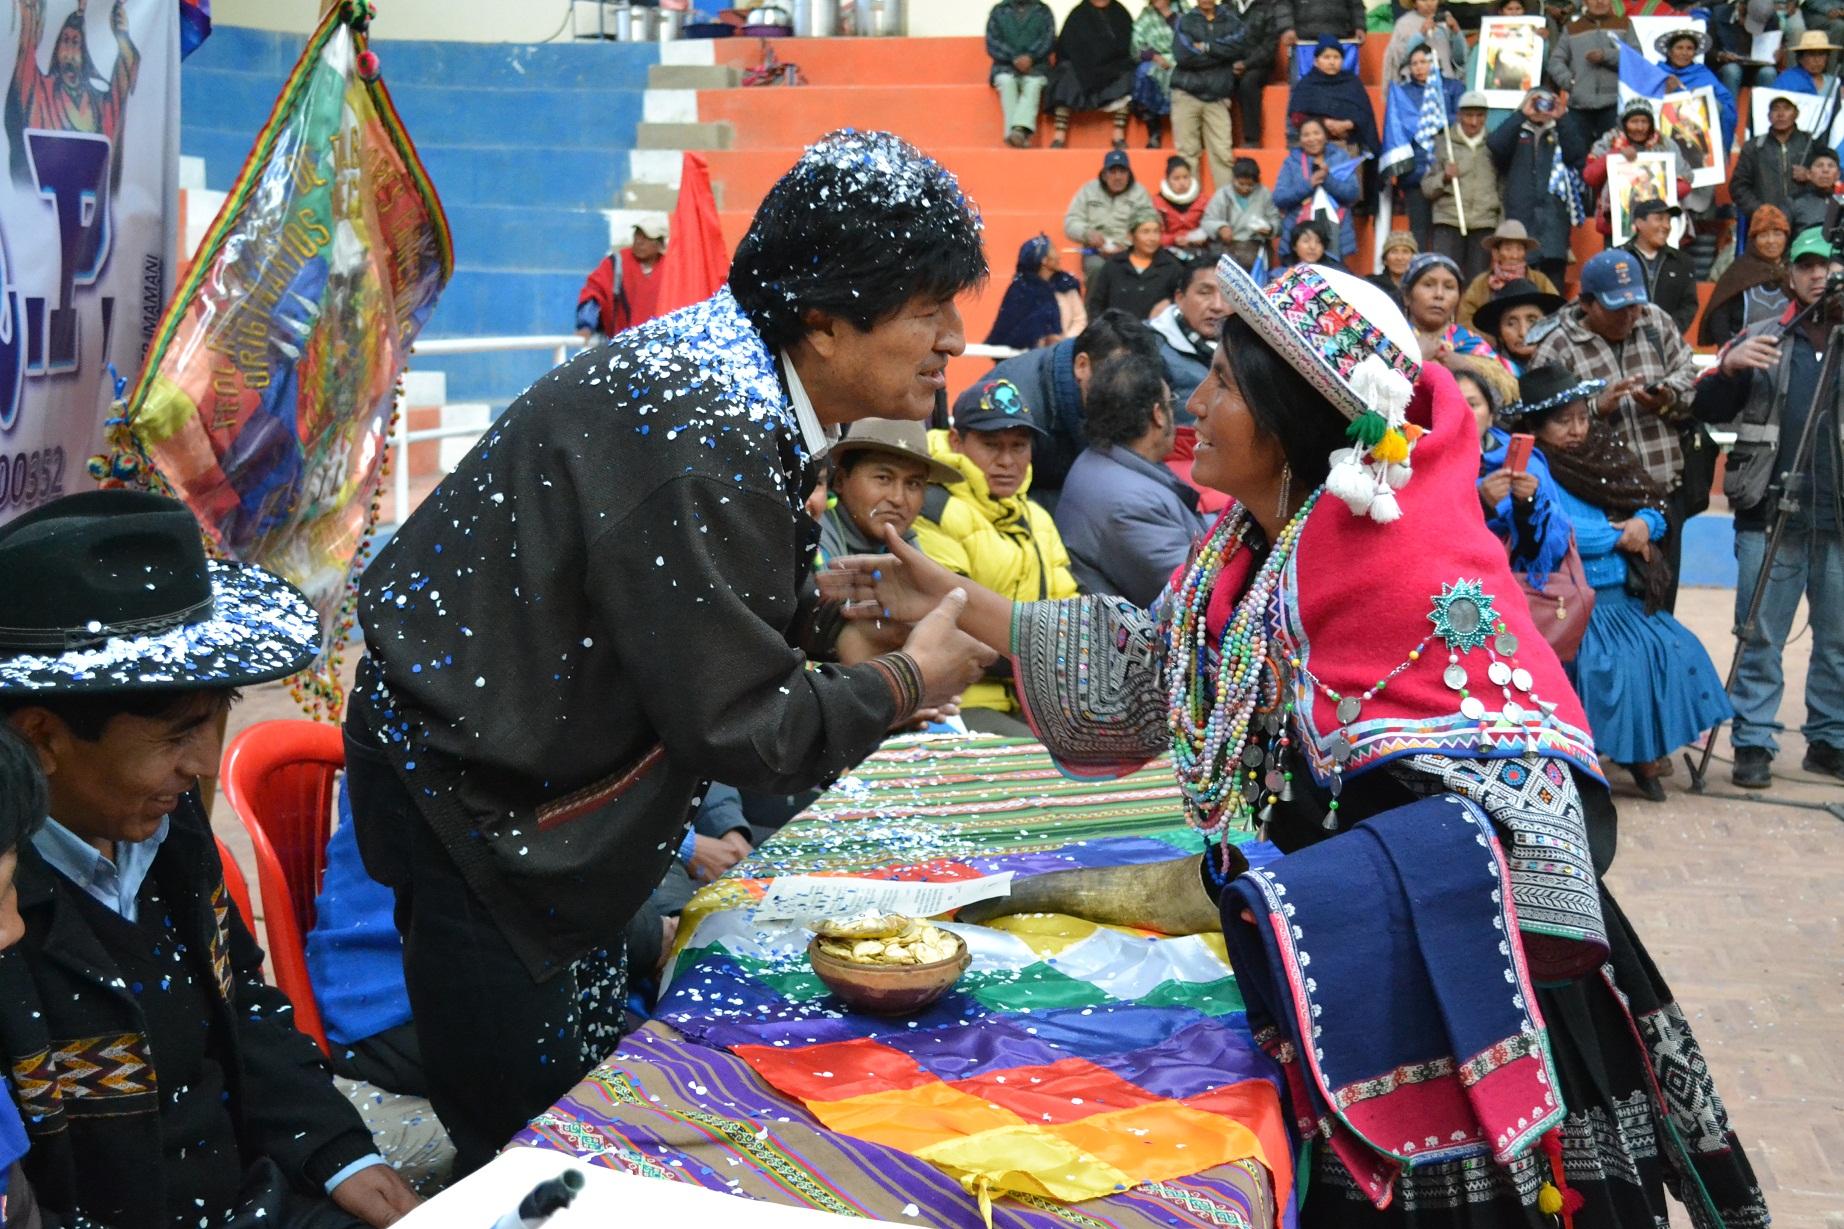 En el Trópico de Cochabamba esperan el regreso de Evo Morales Por Sebastián Ochoa | Sputnik, Rusia